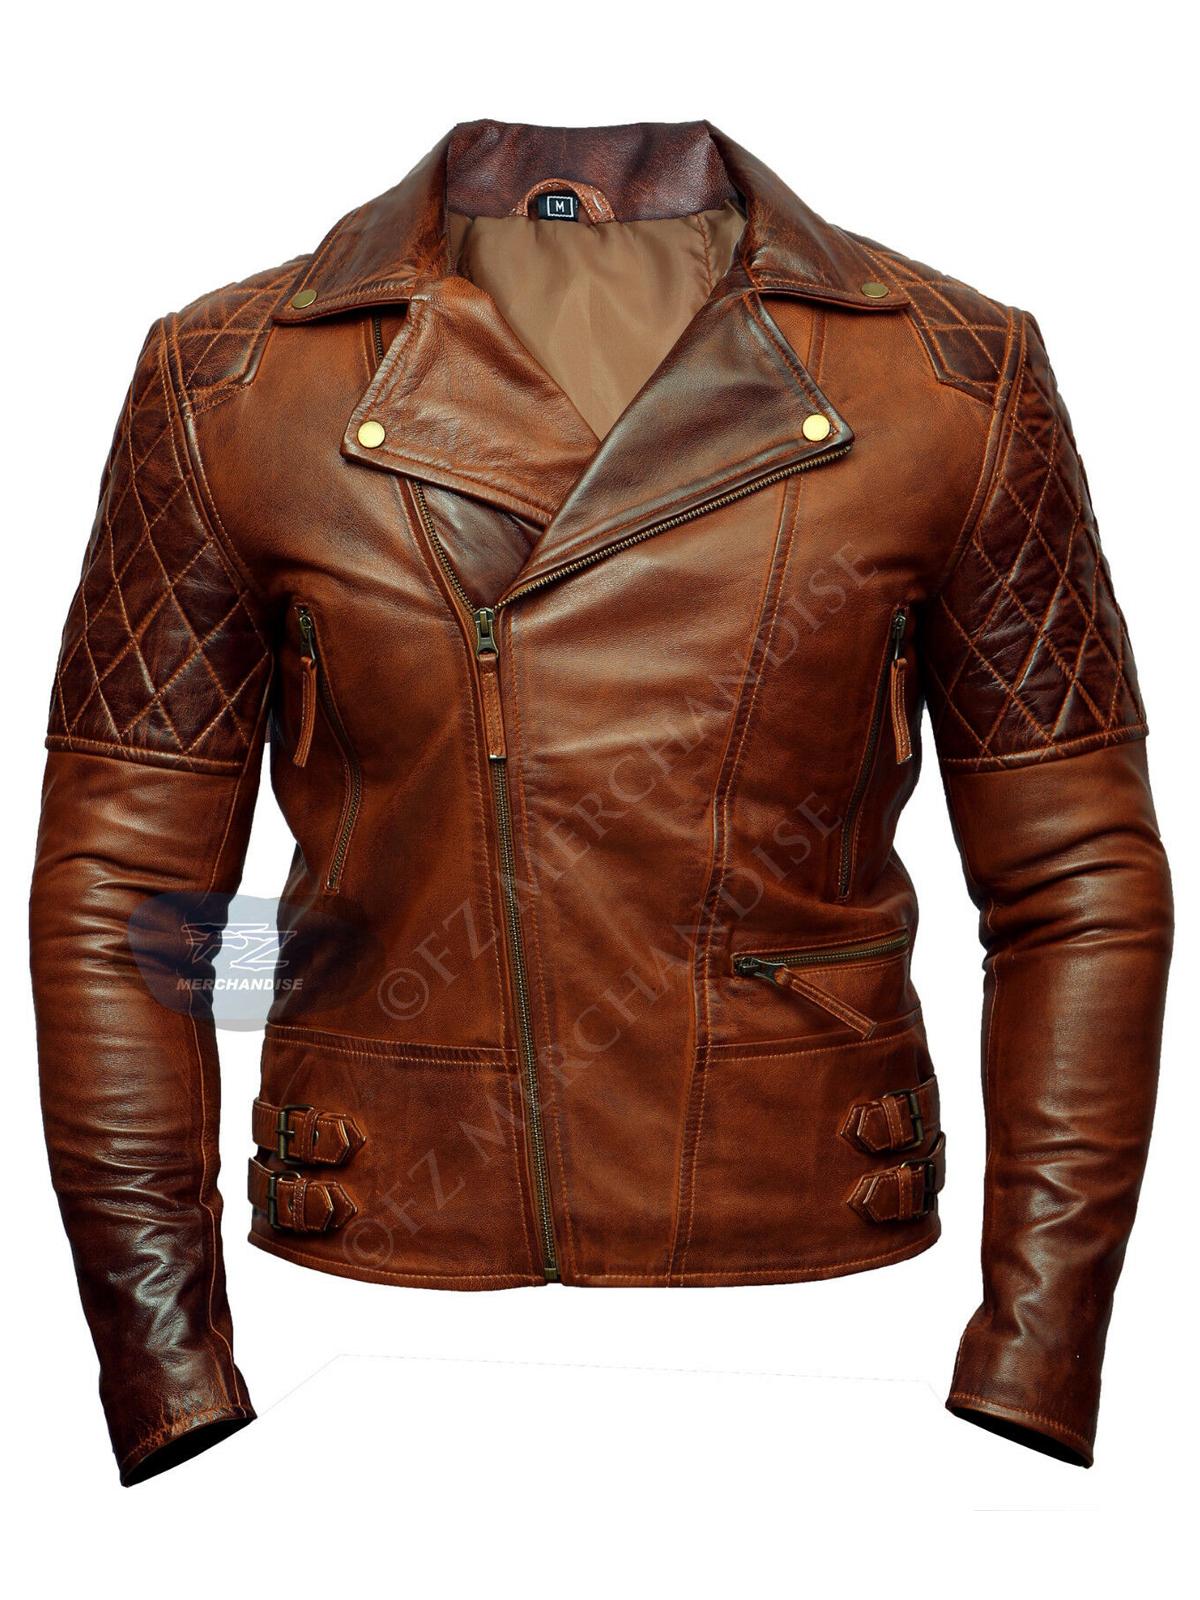 Copper brando Cafe Racer Brown Leather Jacket